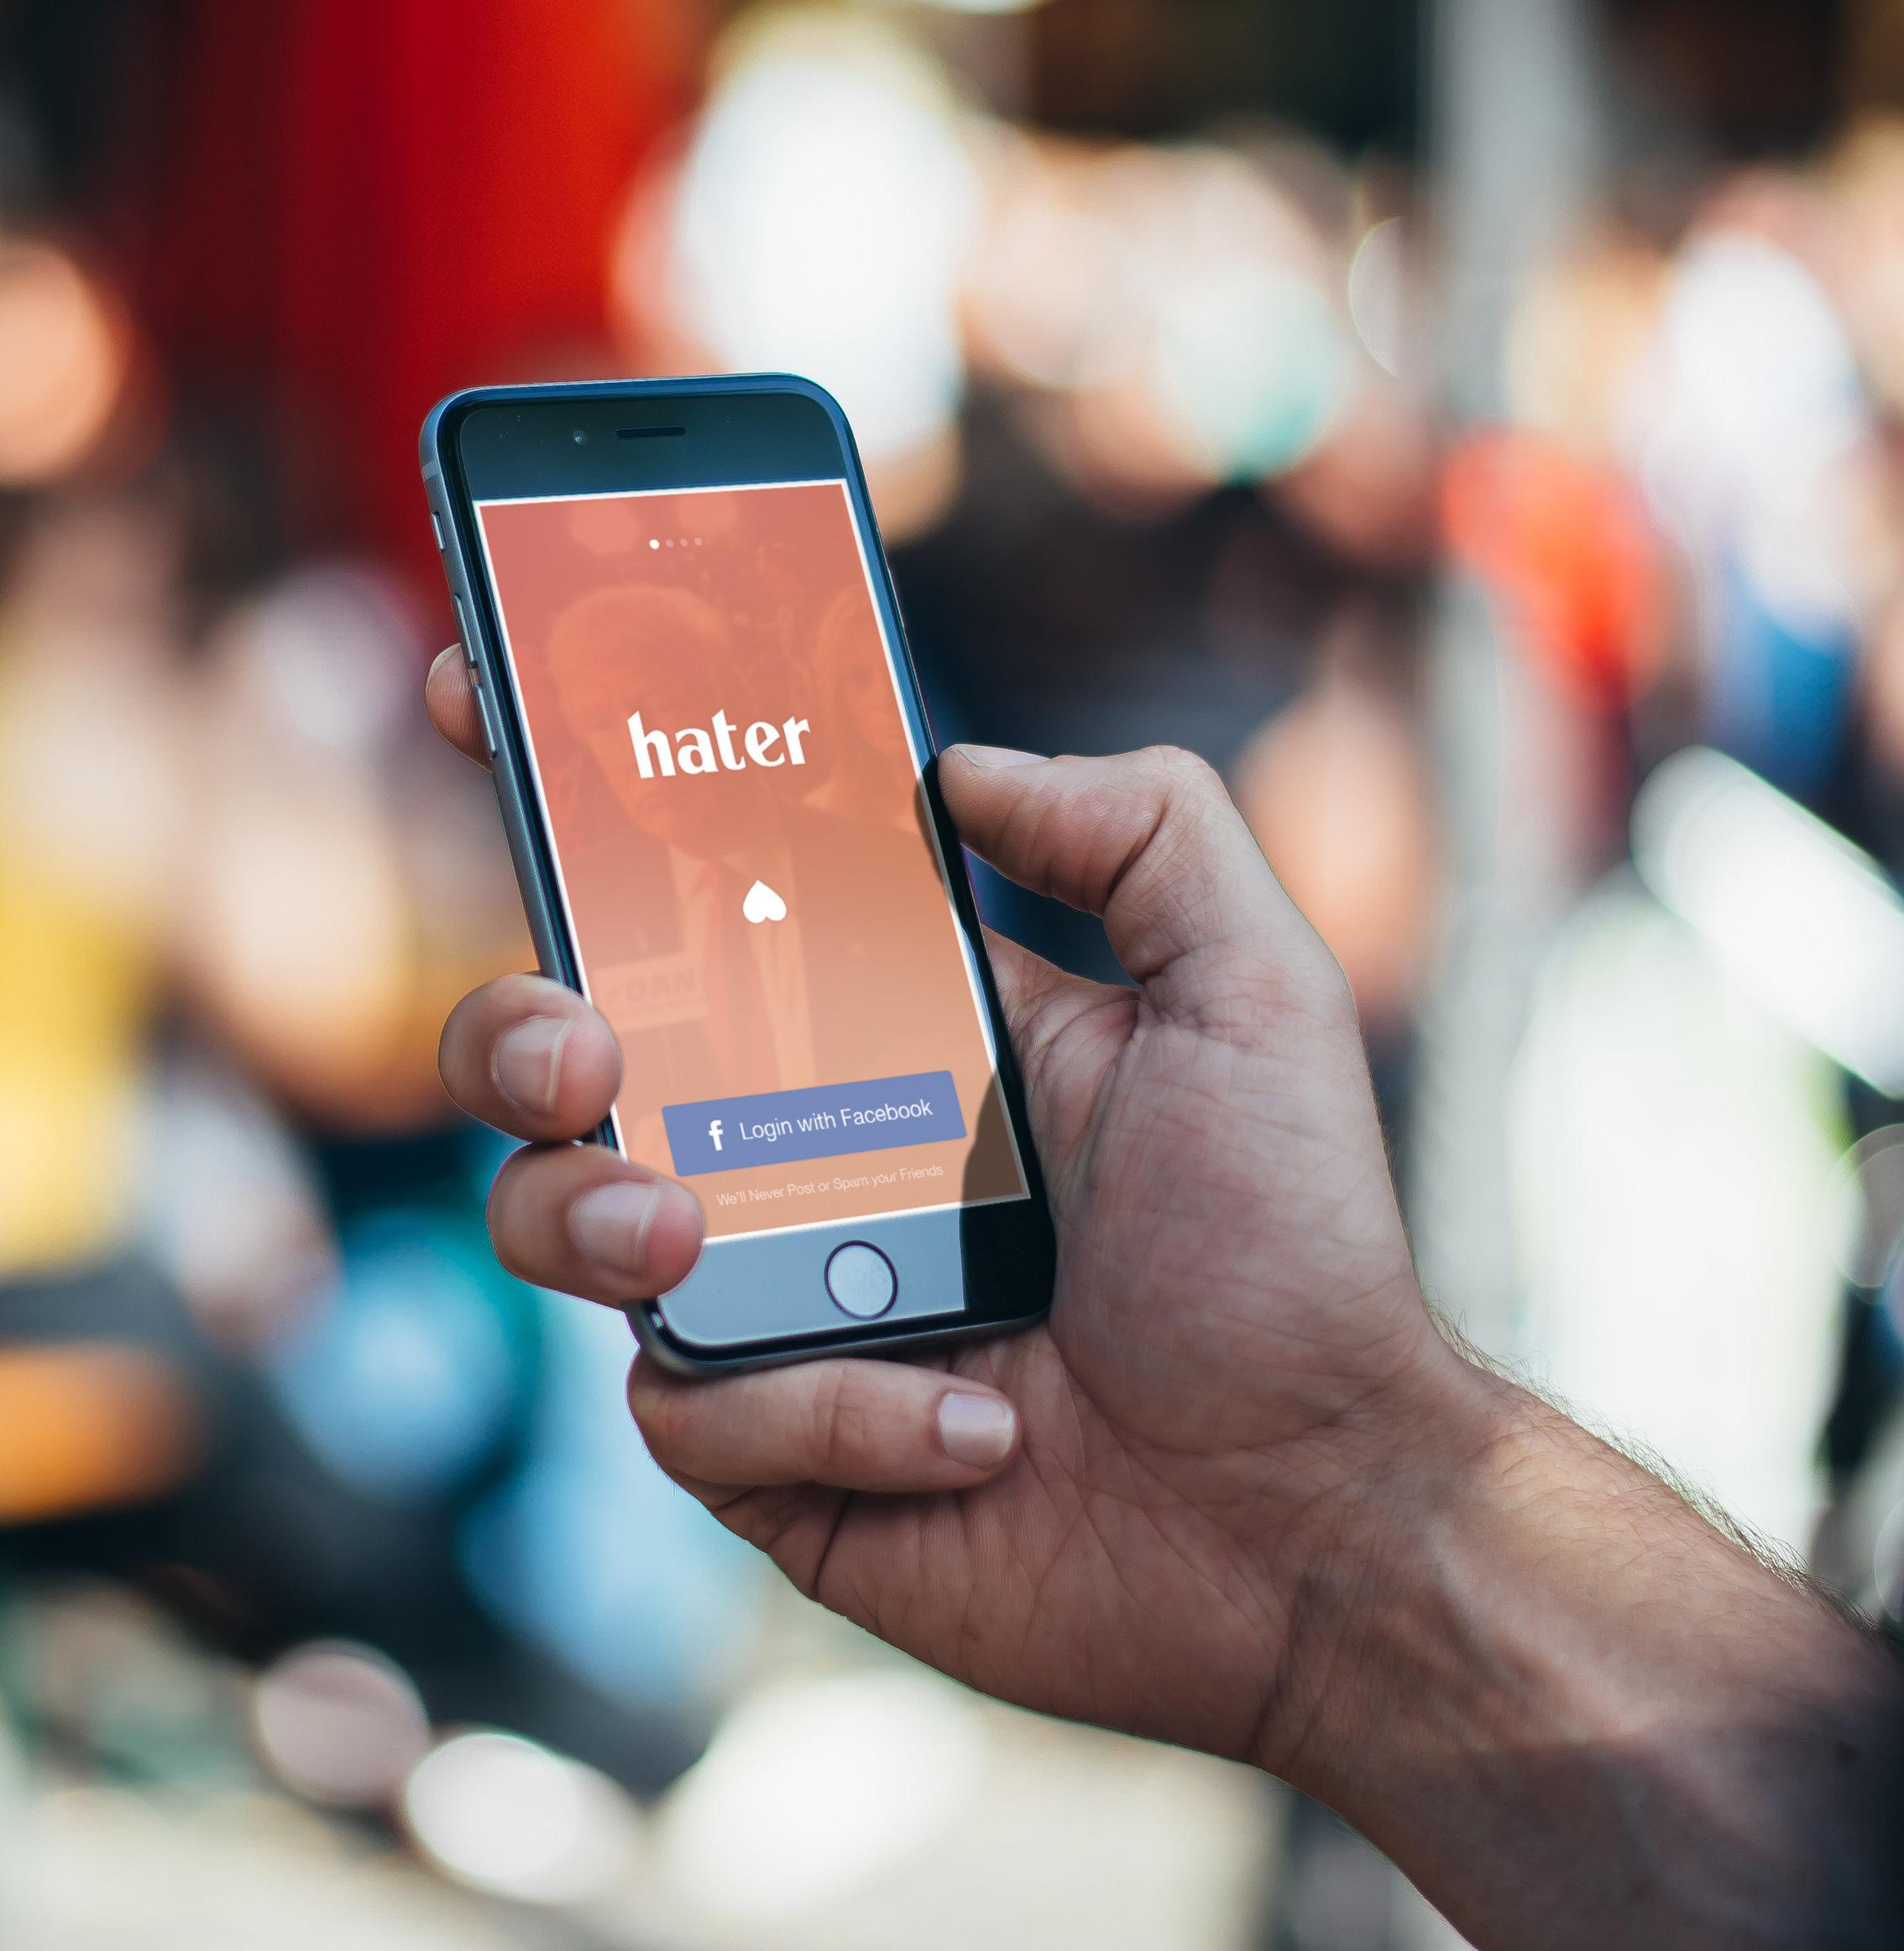 Icebreaker dating app review